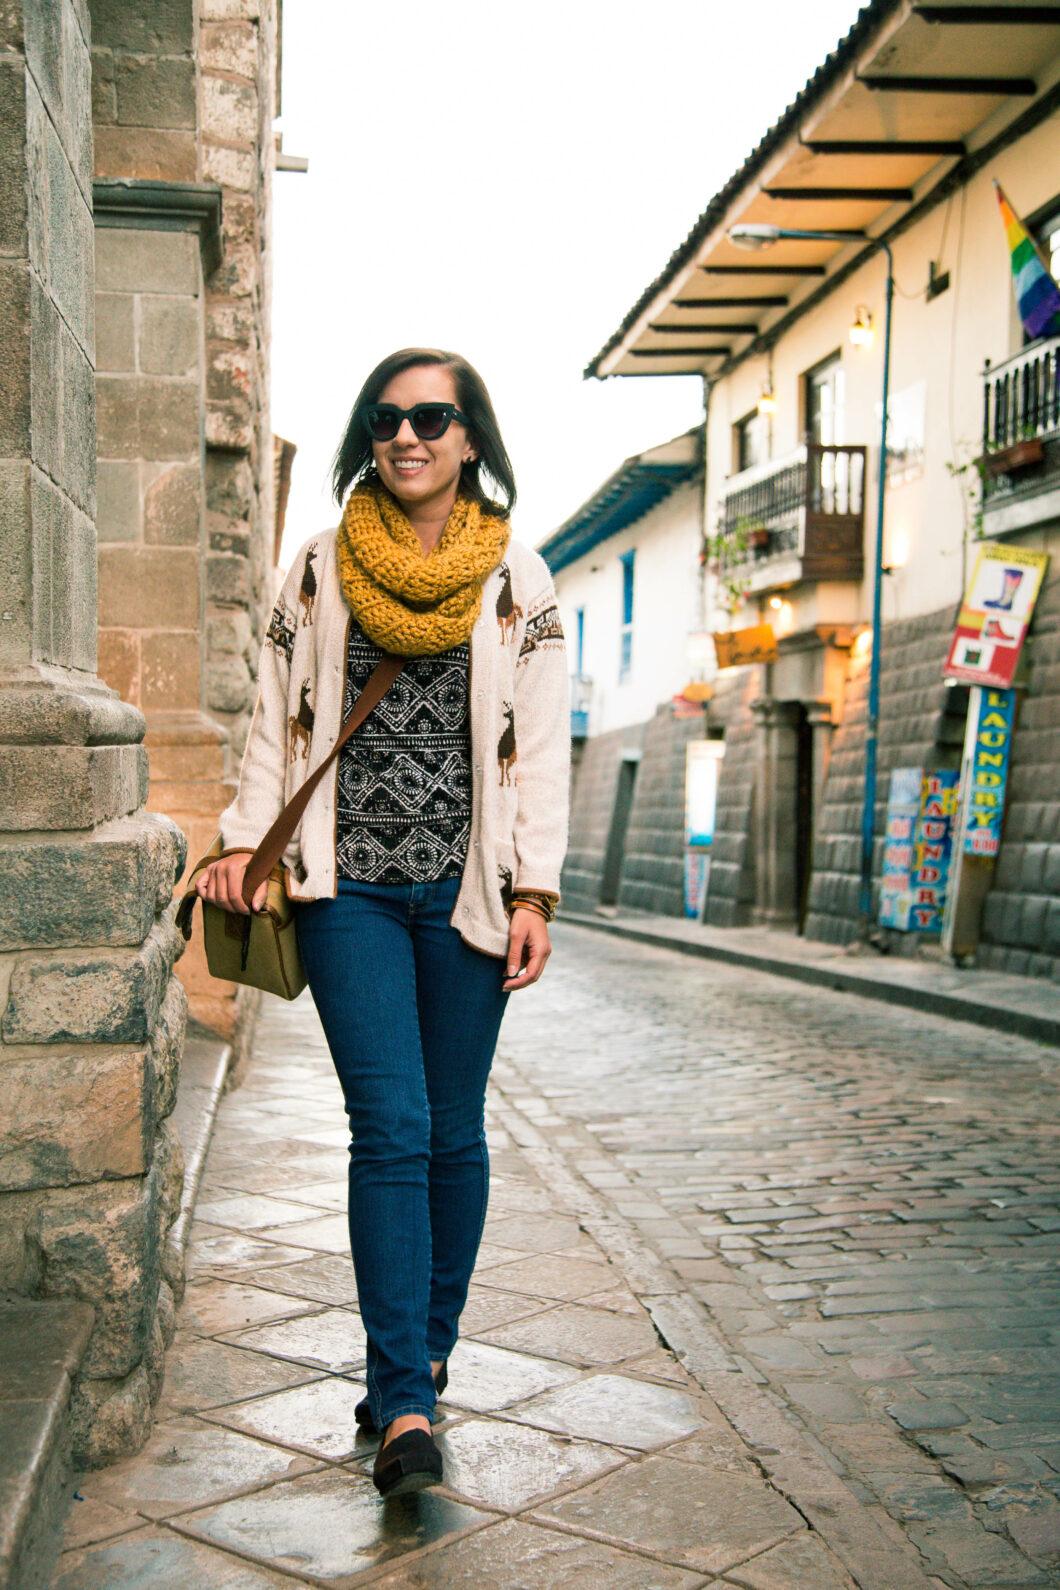 Alpaca Clothing Shopping Tips for Cusco, Peru + What I Wore